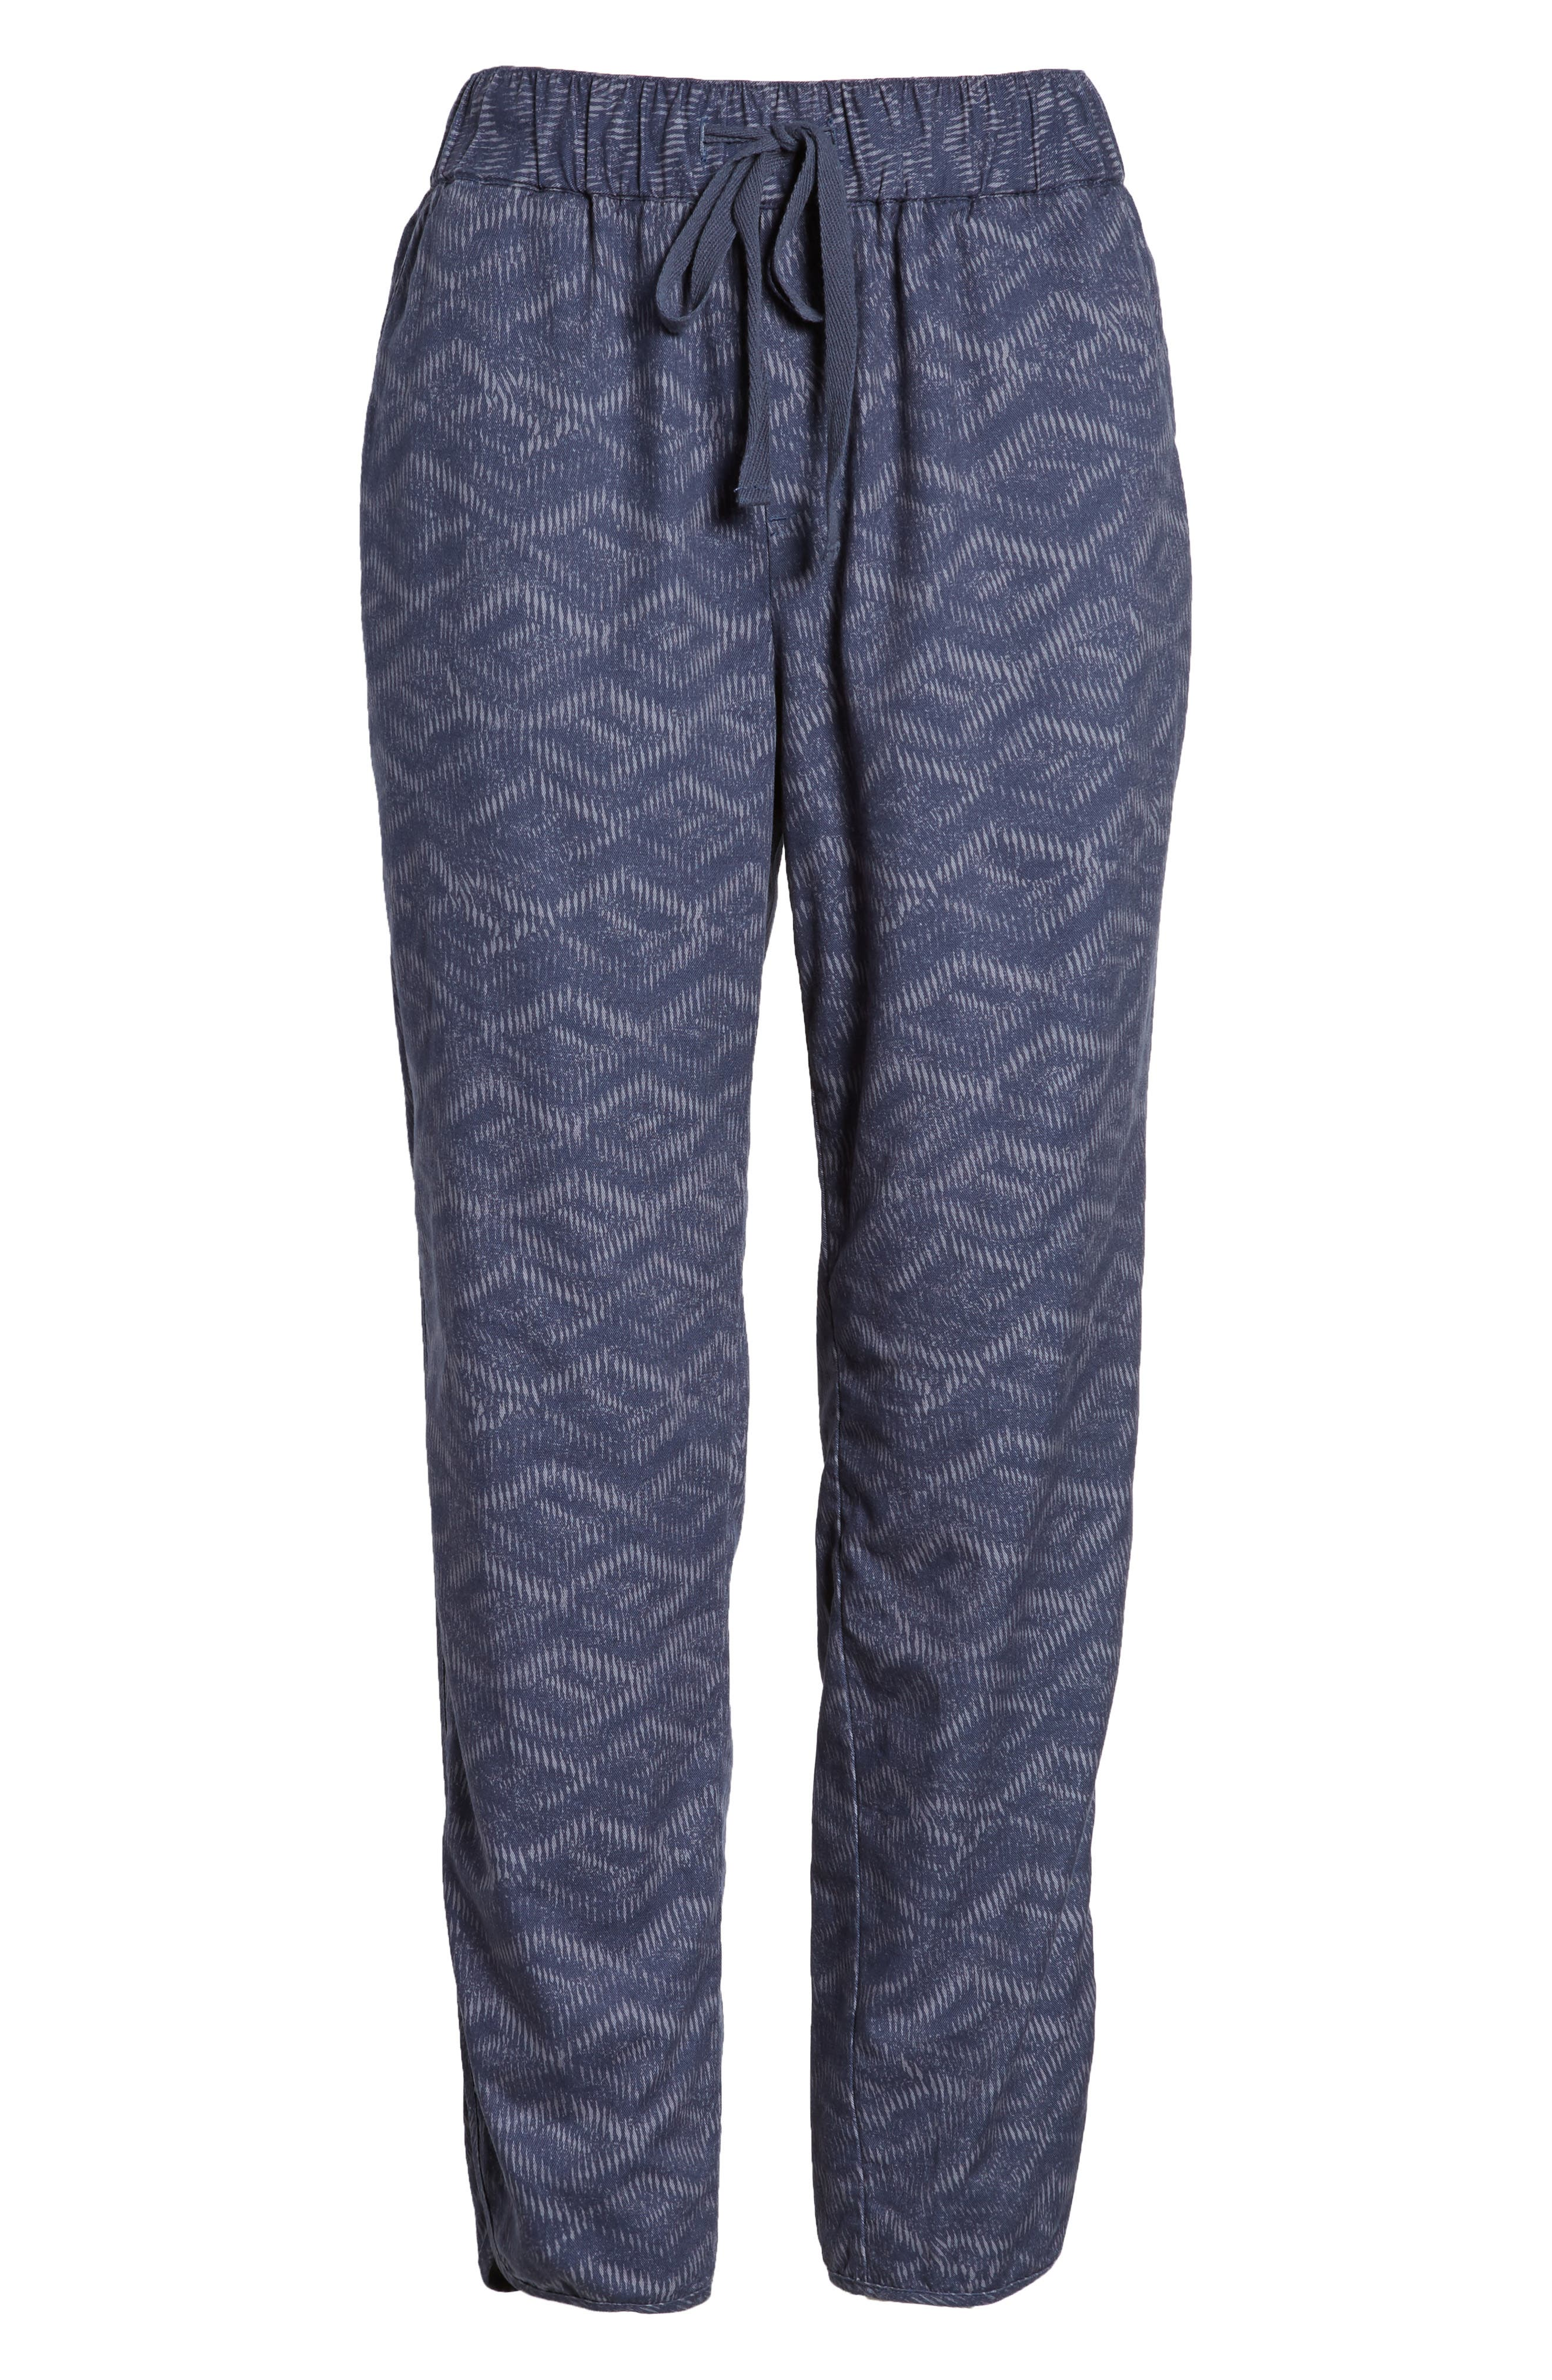 Pattern Cotton Blend Drawstring Pants,                             Alternate thumbnail 7, color,                             Navy Ikat Diamonds